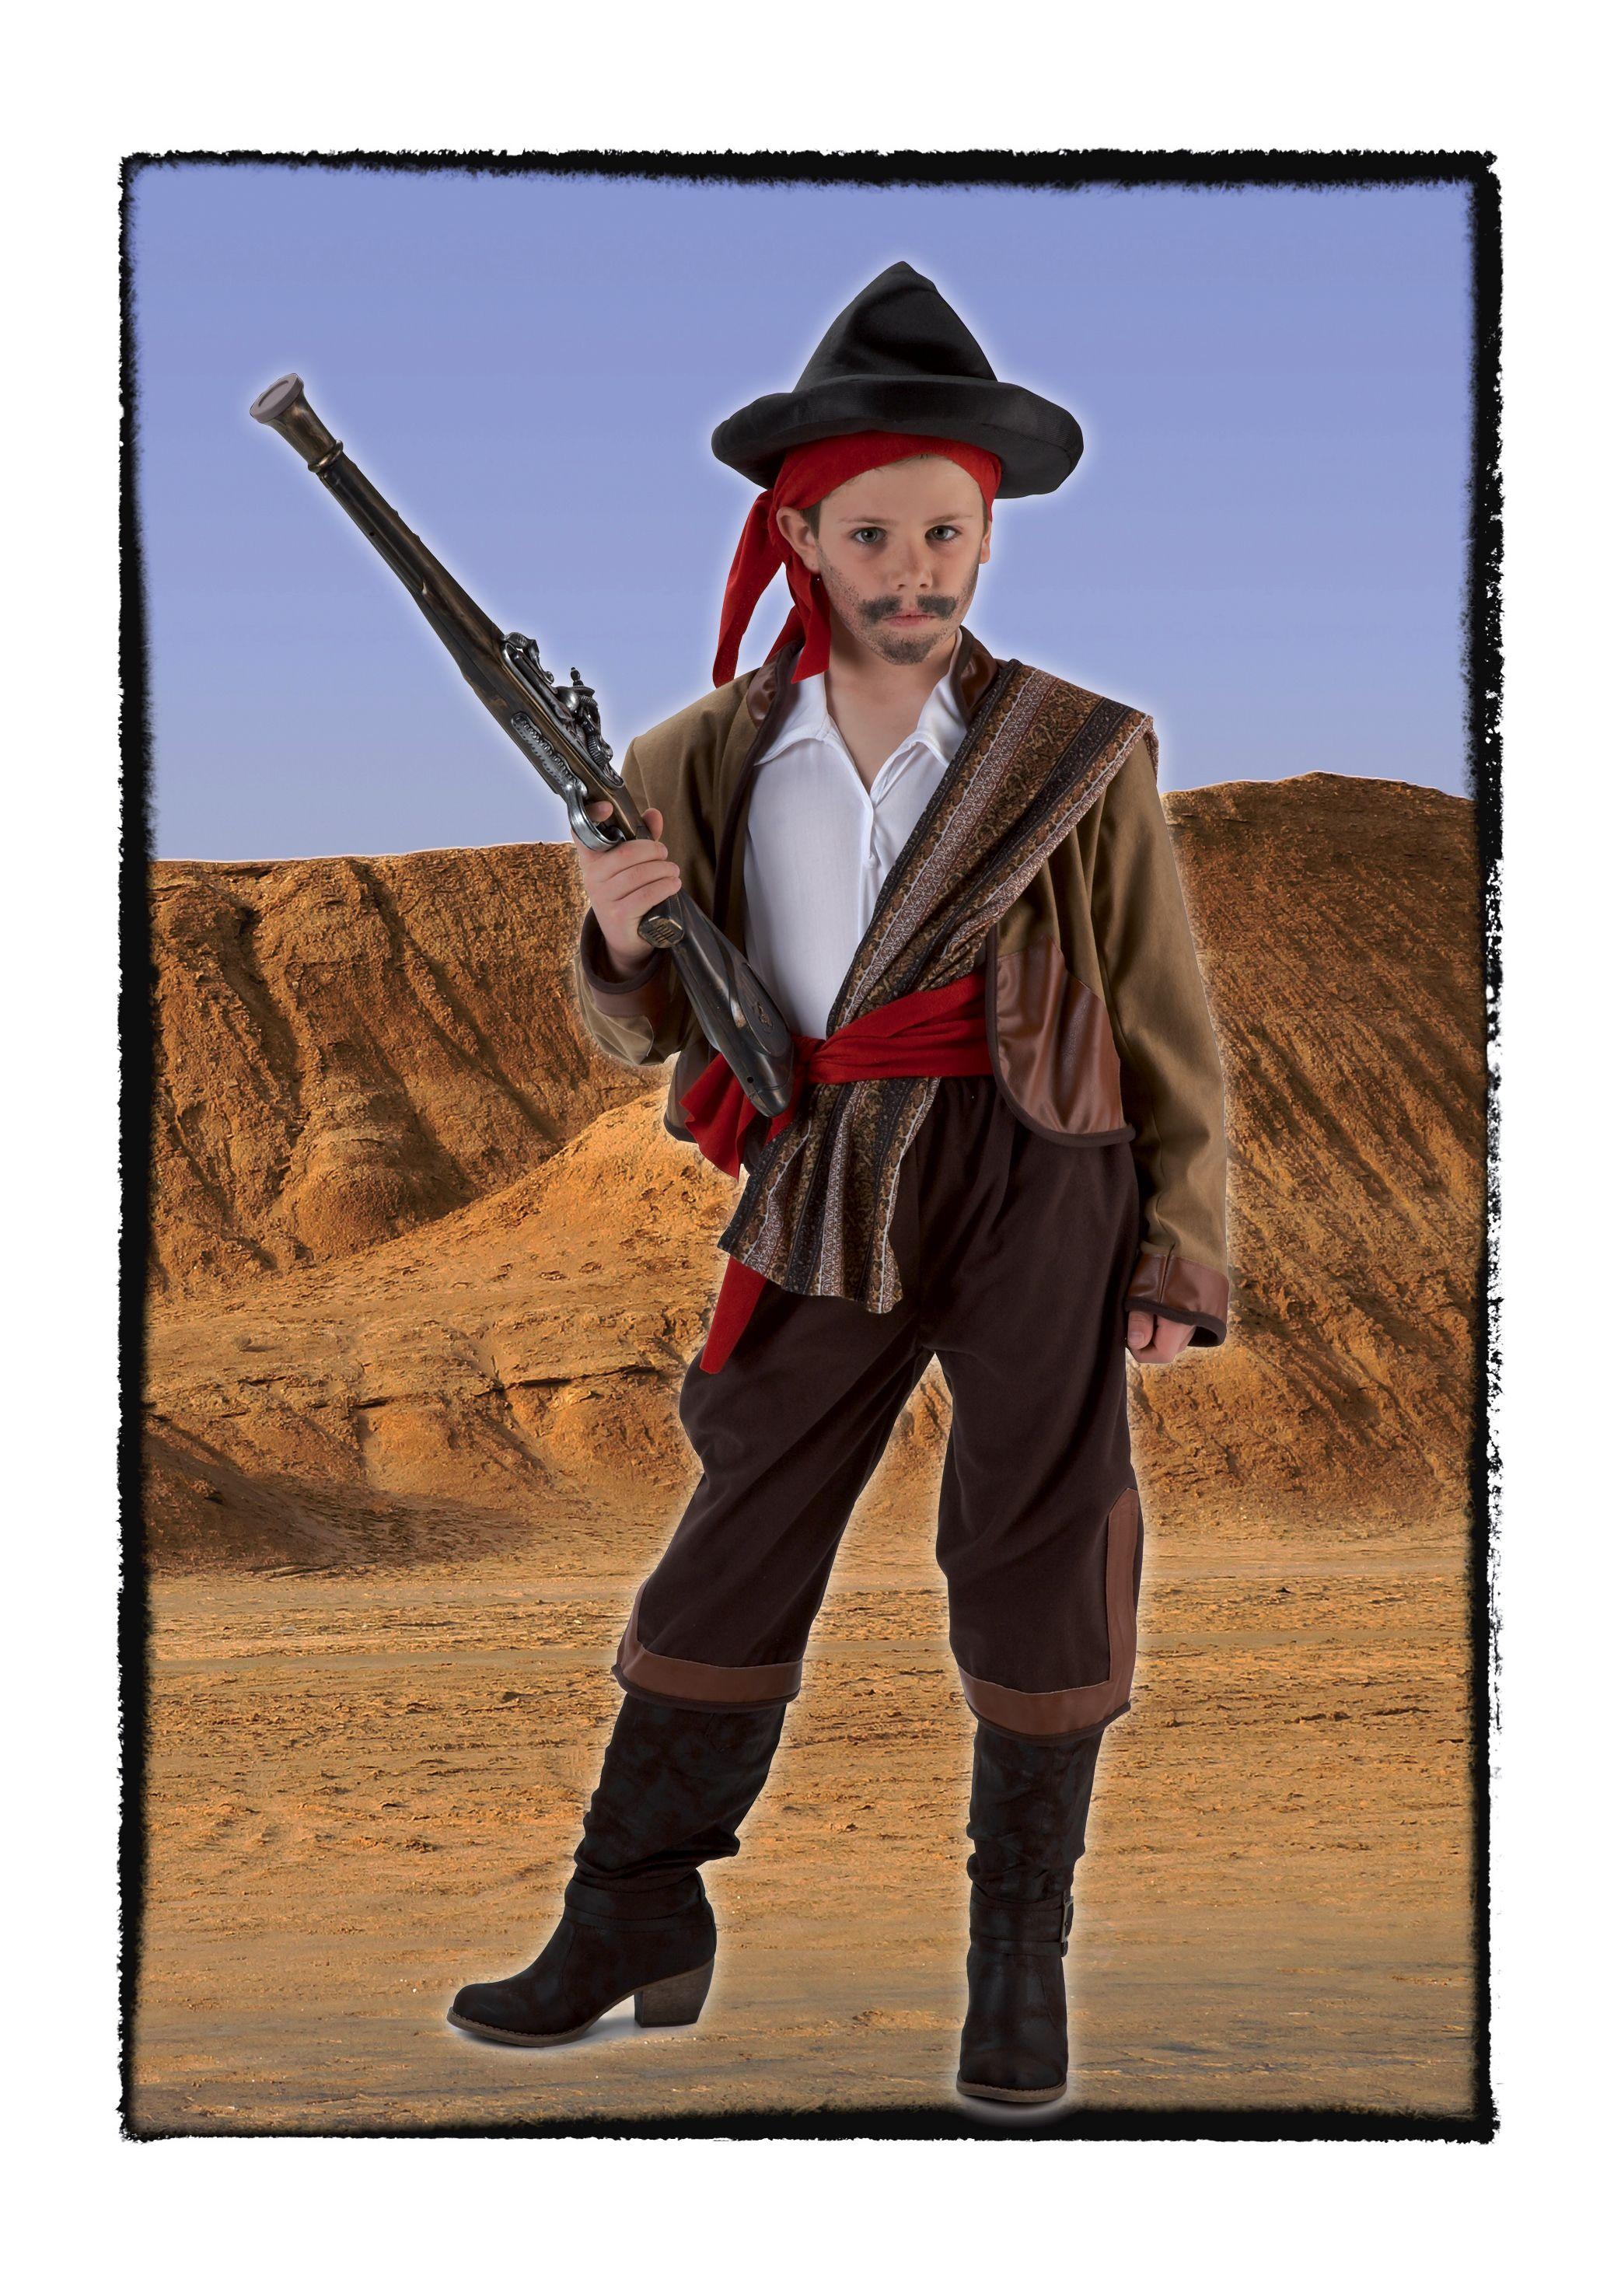 Disfraz de Bandolero infantil. #disfraces para ser un pequeño Curro Jimenez